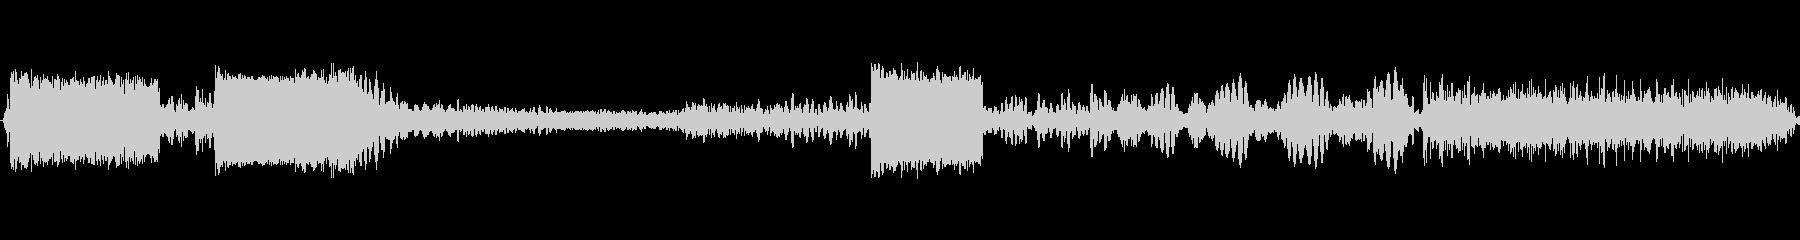 SciFi EC01_86_1の未再生の波形